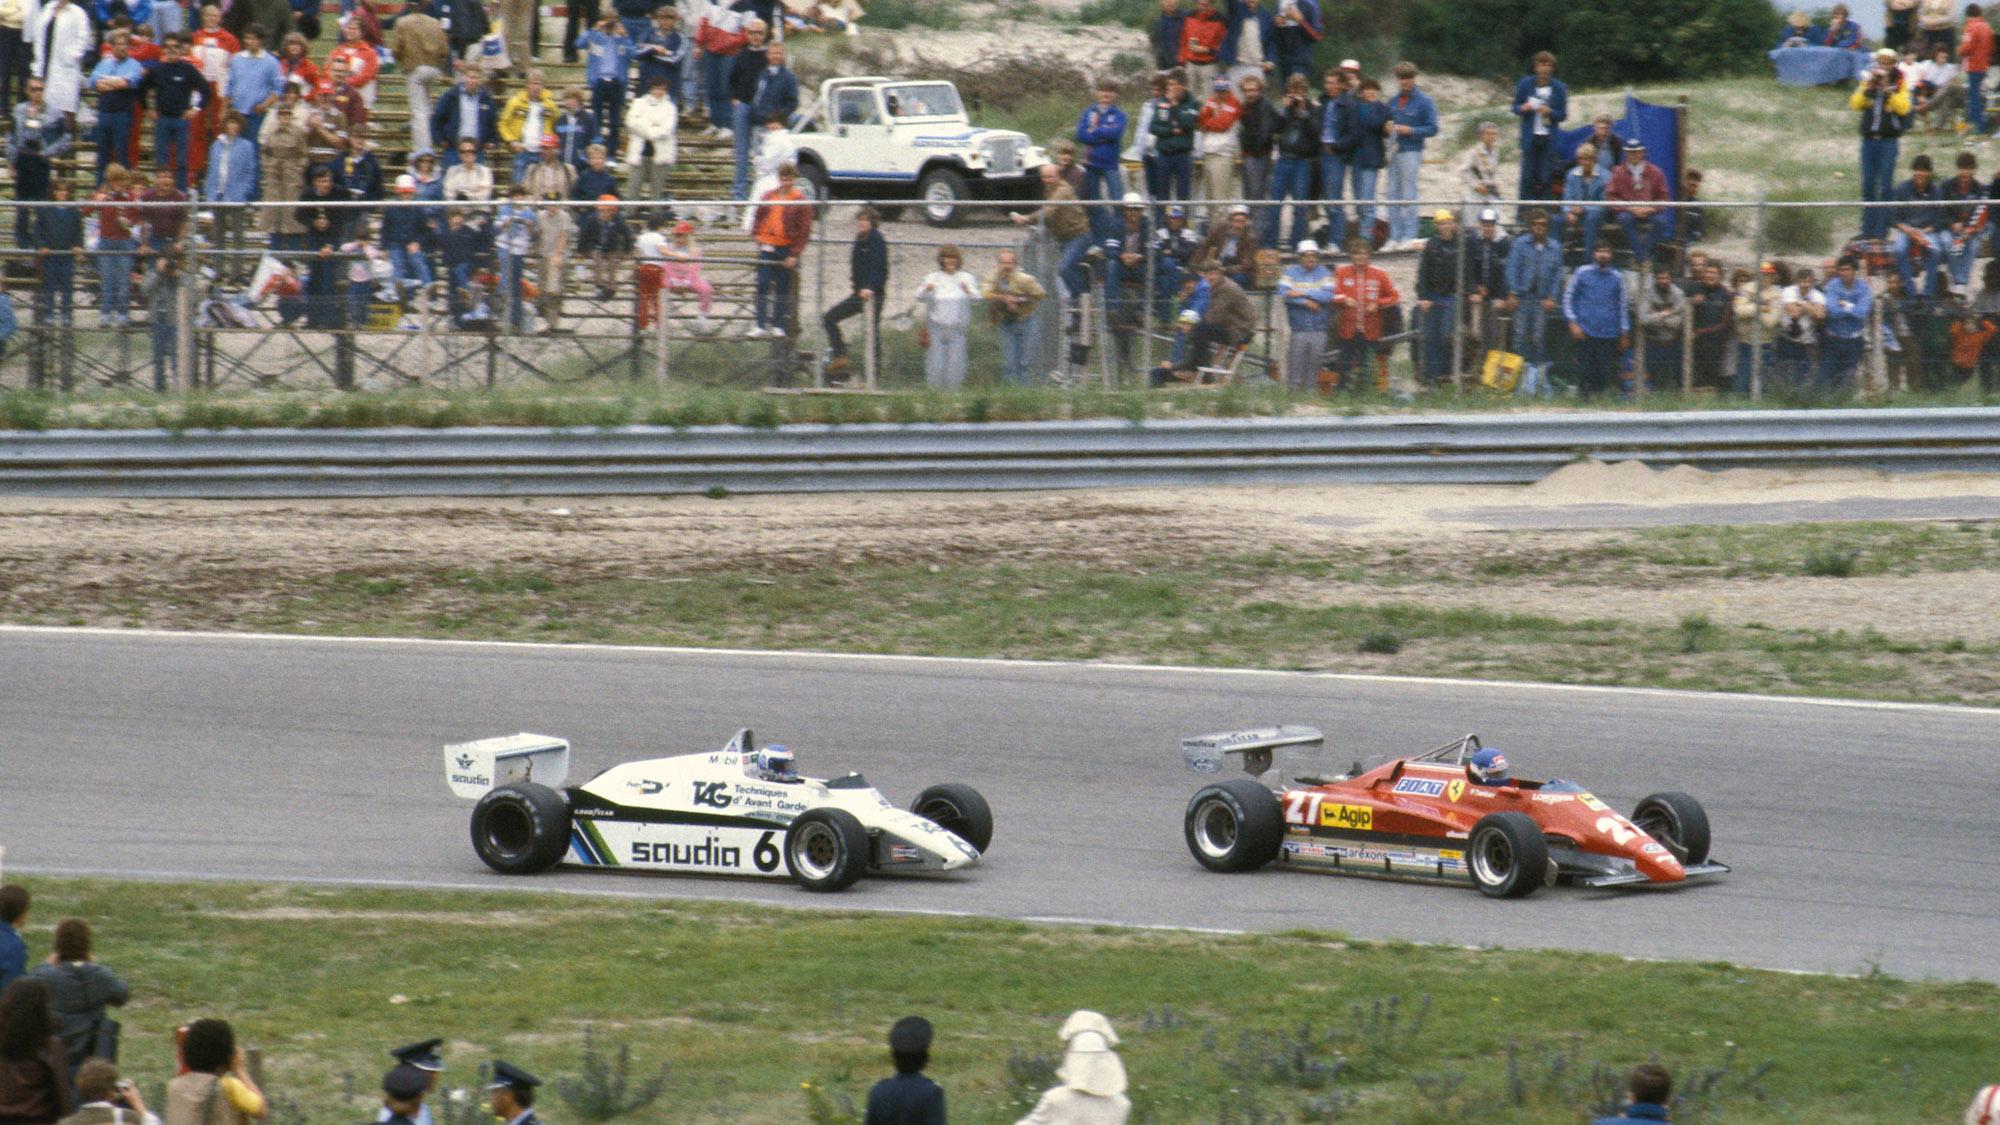 Patrick Tambay leads Keke rosberg in the 1981 Dutch Grand prix